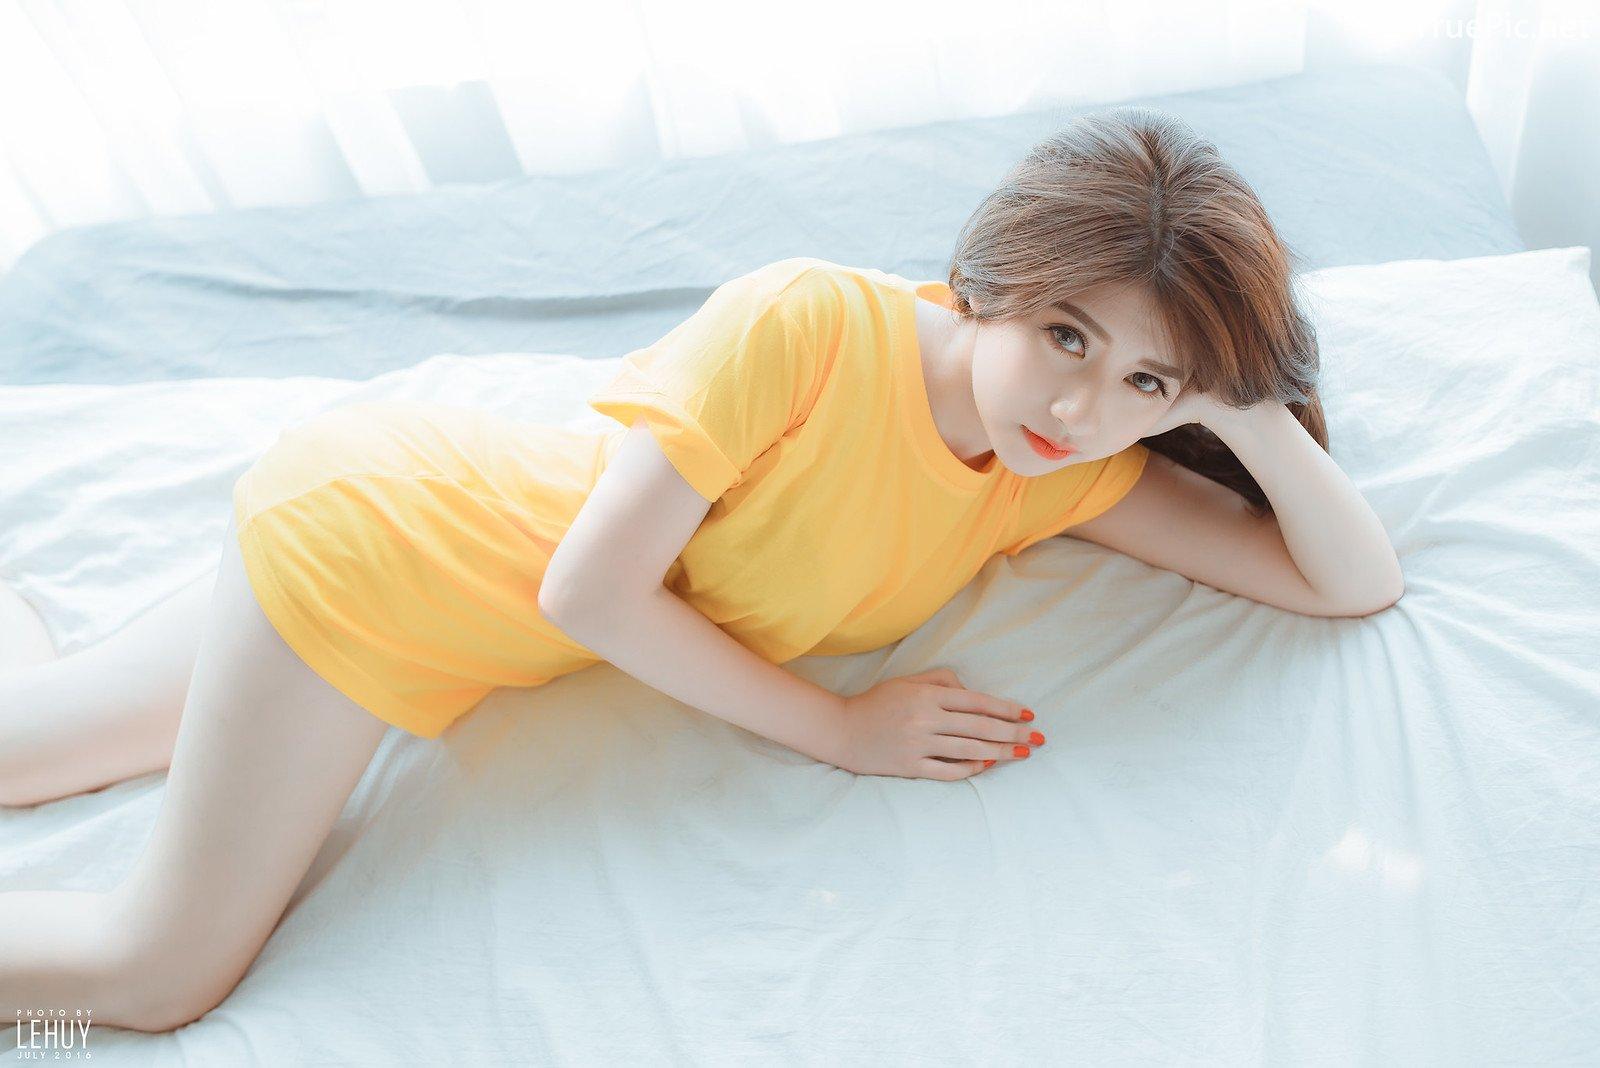 Image-Vietnamese-Hot-Girl-Photo-Cute-Little-Pikachu-Girl-TruePic.net- Picture-8